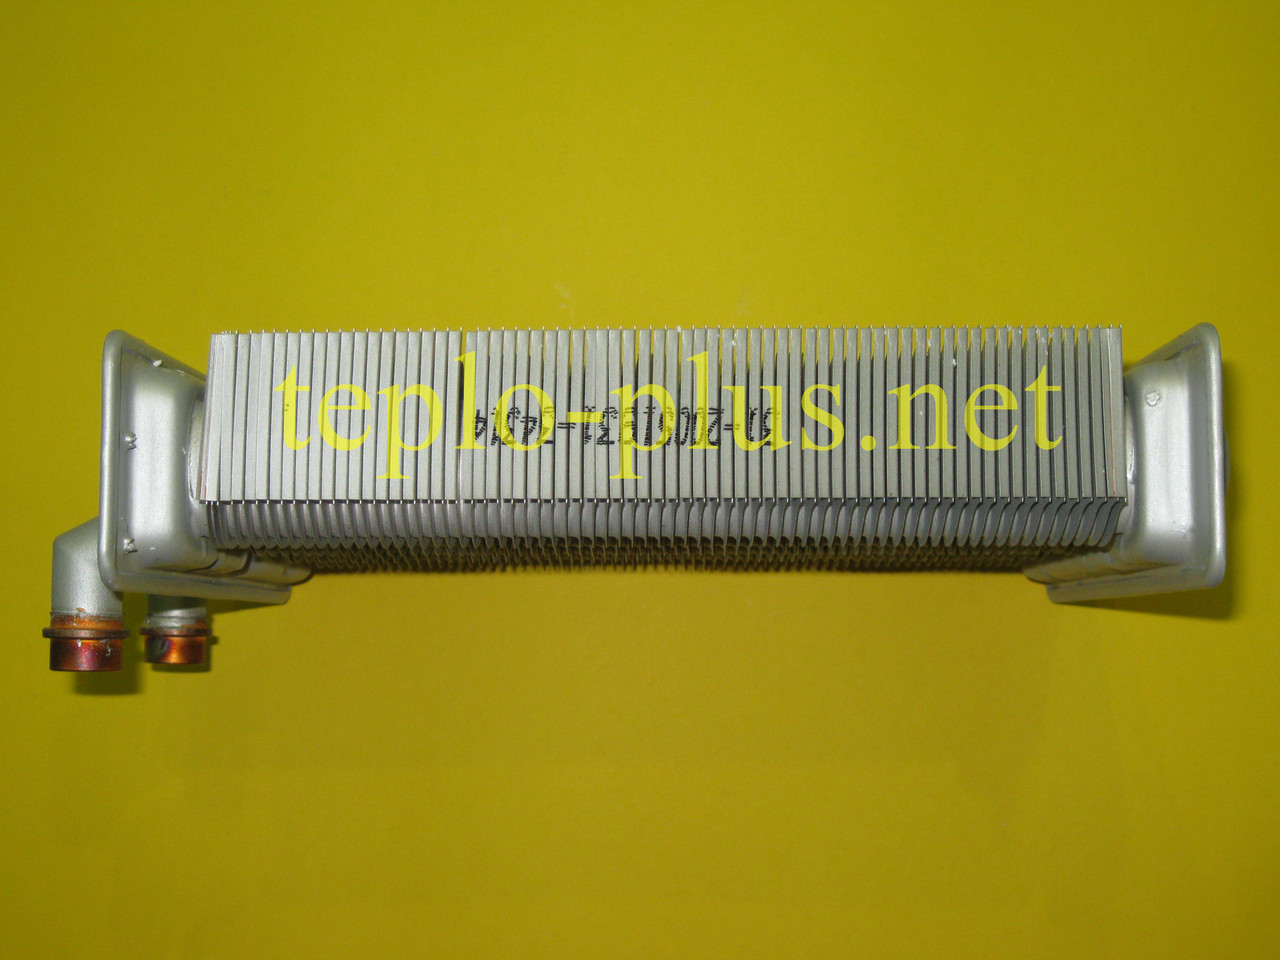 Теплообменник beretta city 24 csi теплообменник для углового камина